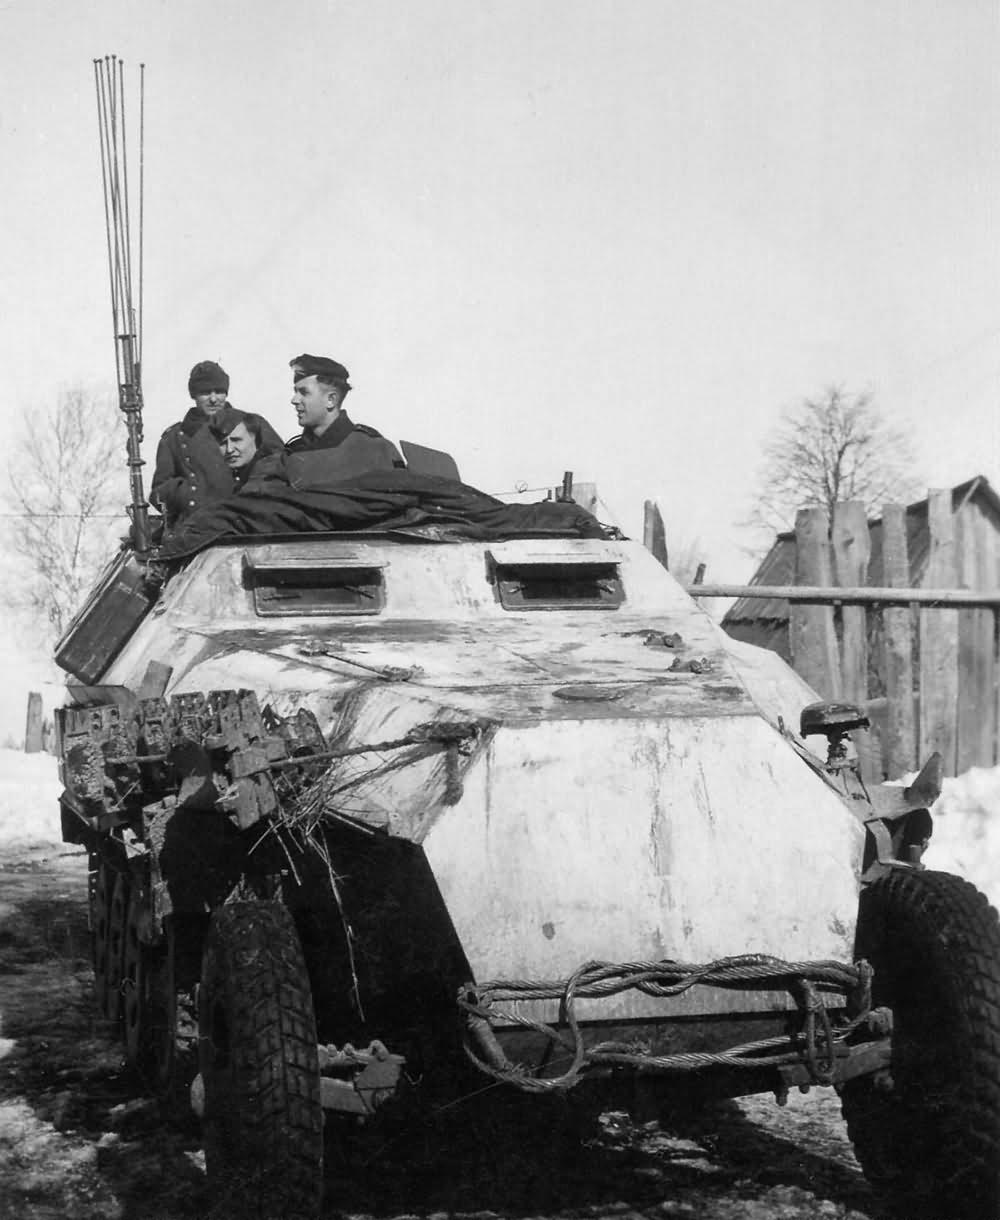 SdKfz 251/3 Ausf D